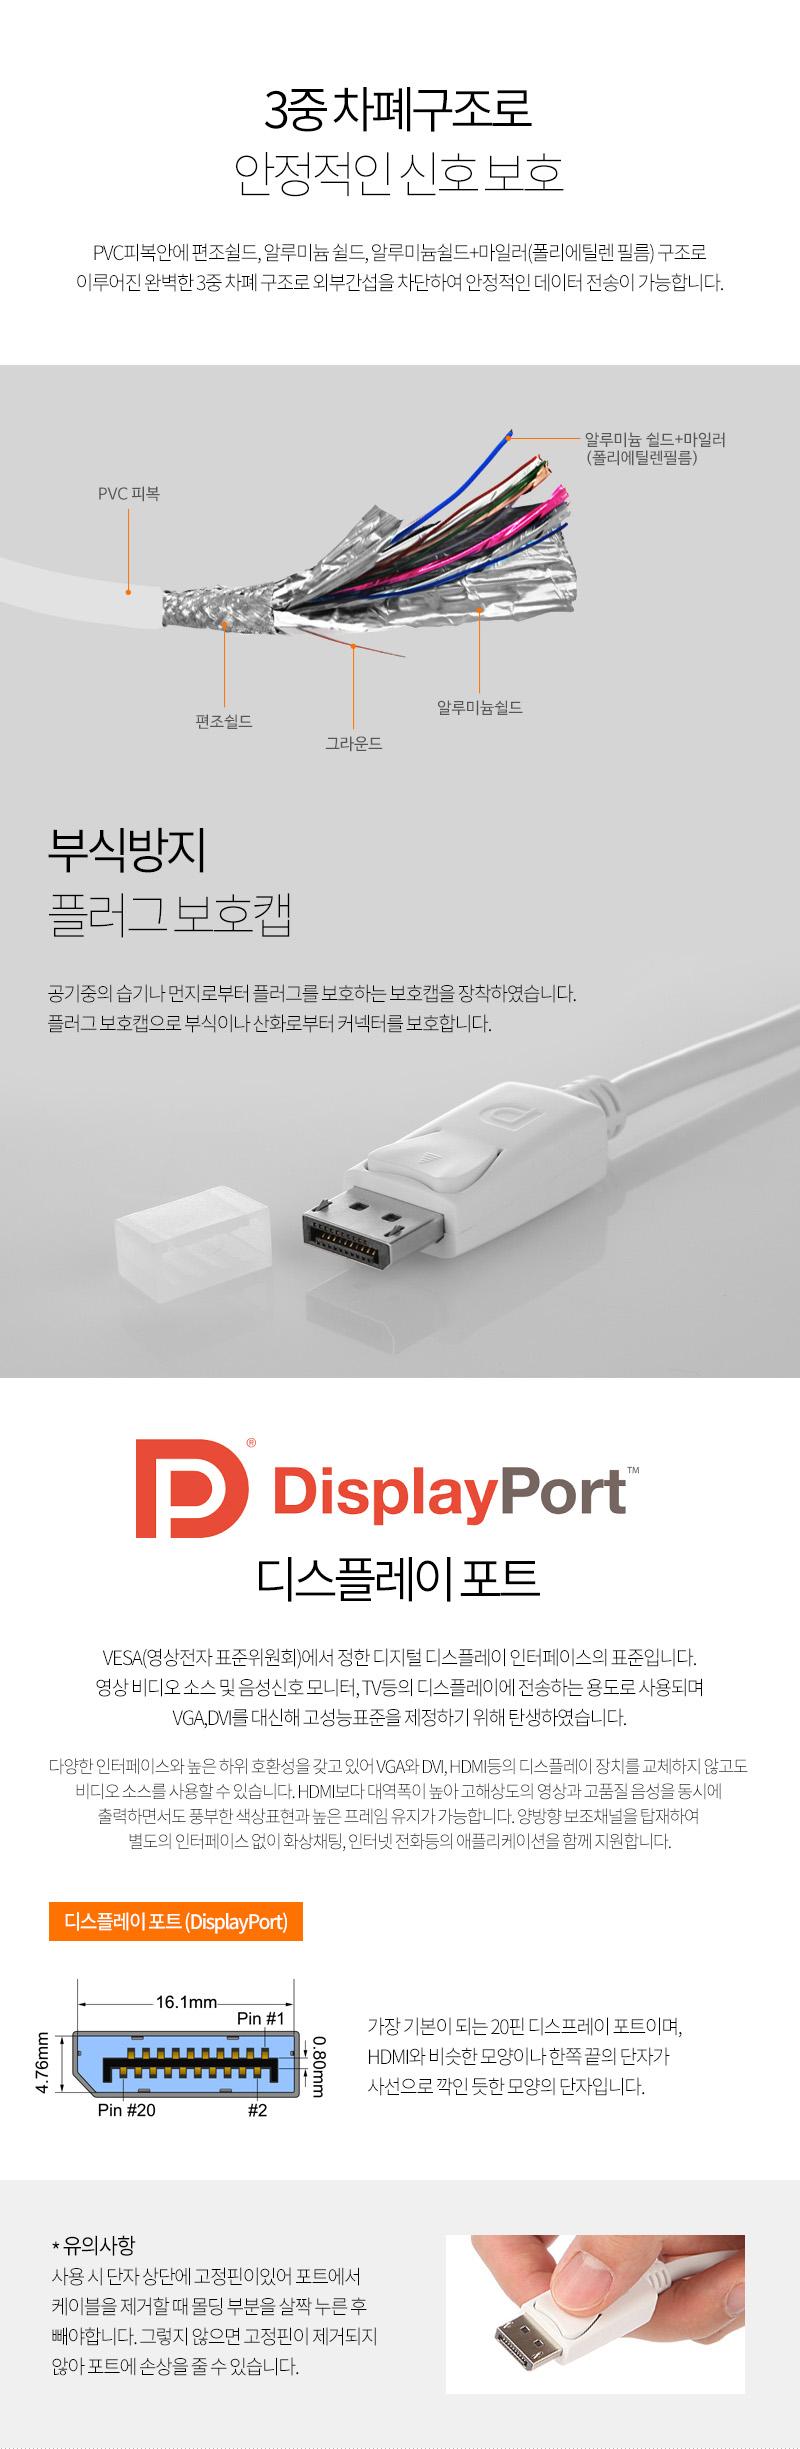 j5create DisplayPort to HDMI 케이블 (JDC158) (1.8m)